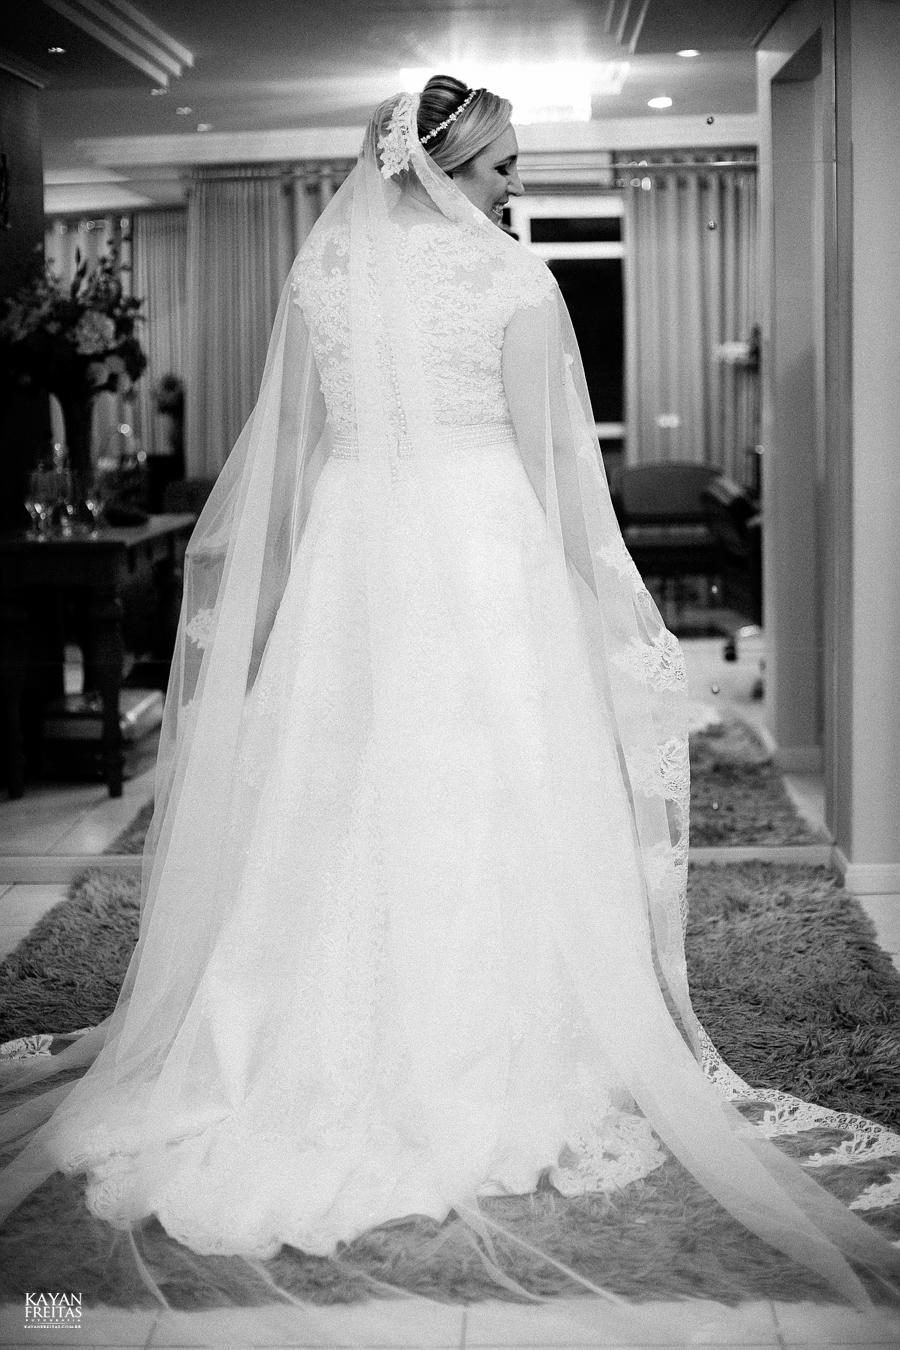 larissa-junior-casamento-0043 Larissa + Junior - Casamento em Biguaçu